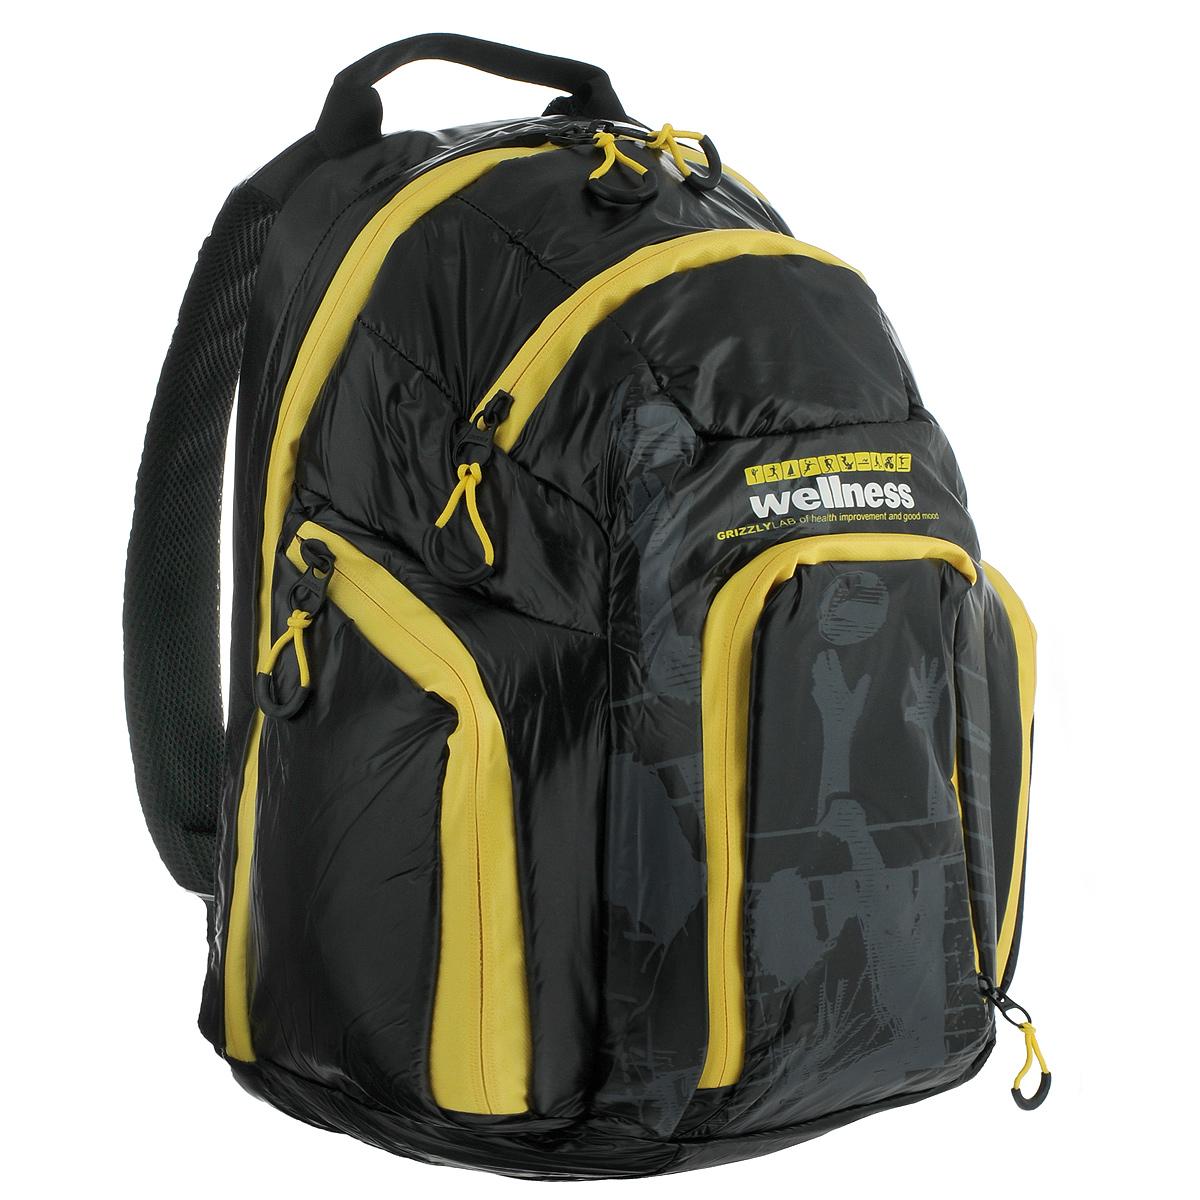 Рюкзак Grizzly рюкзак grizzly rg 867 2 2 fuchsia